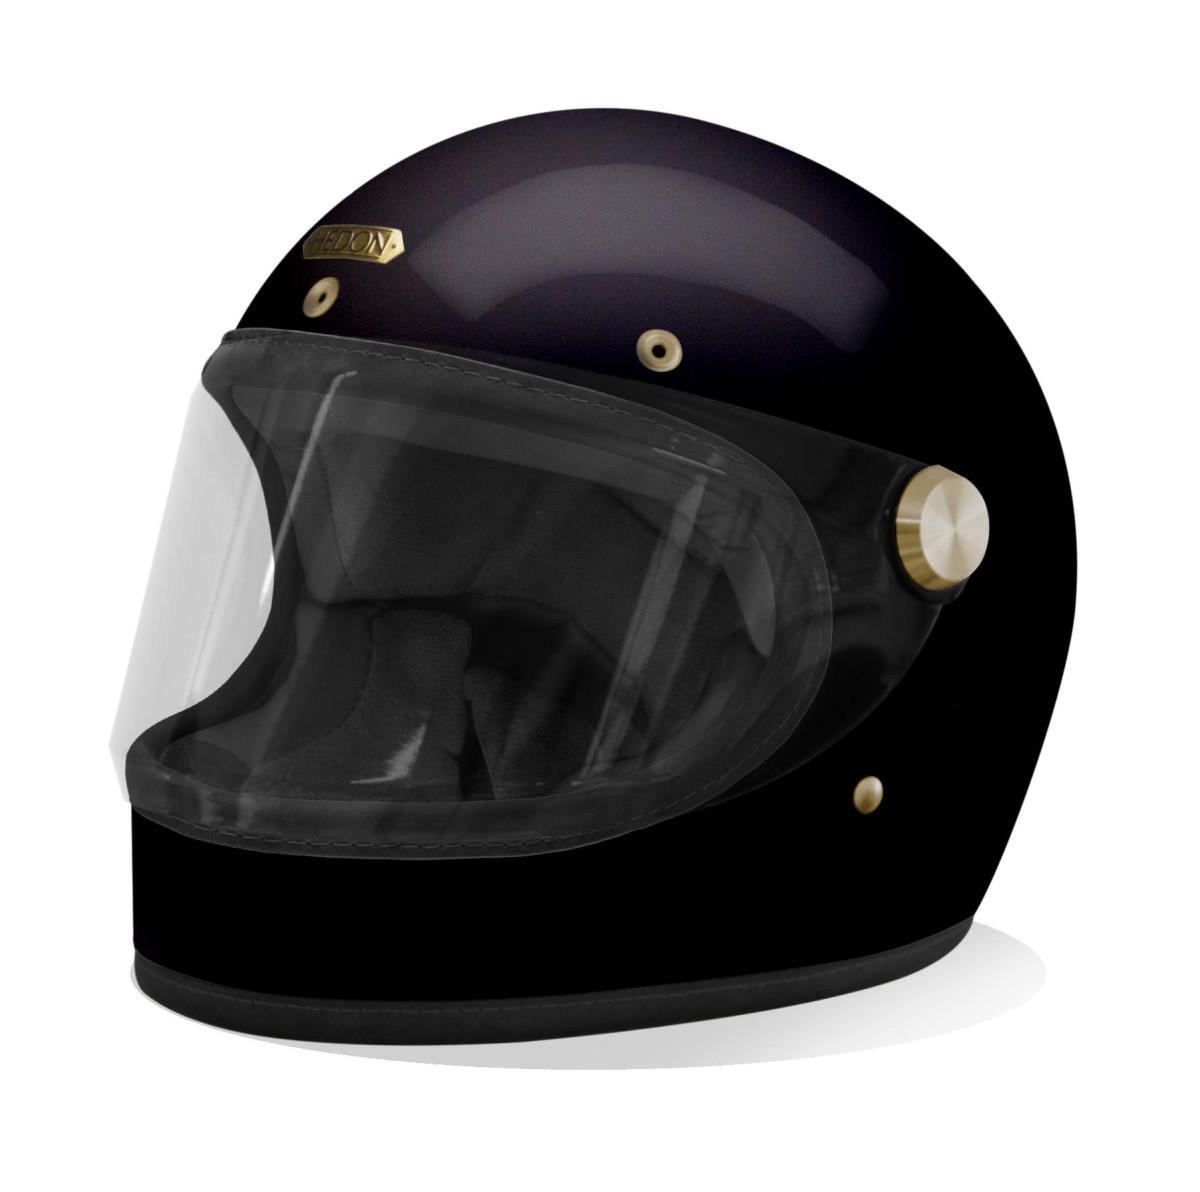 Heroine Racer Black Profile